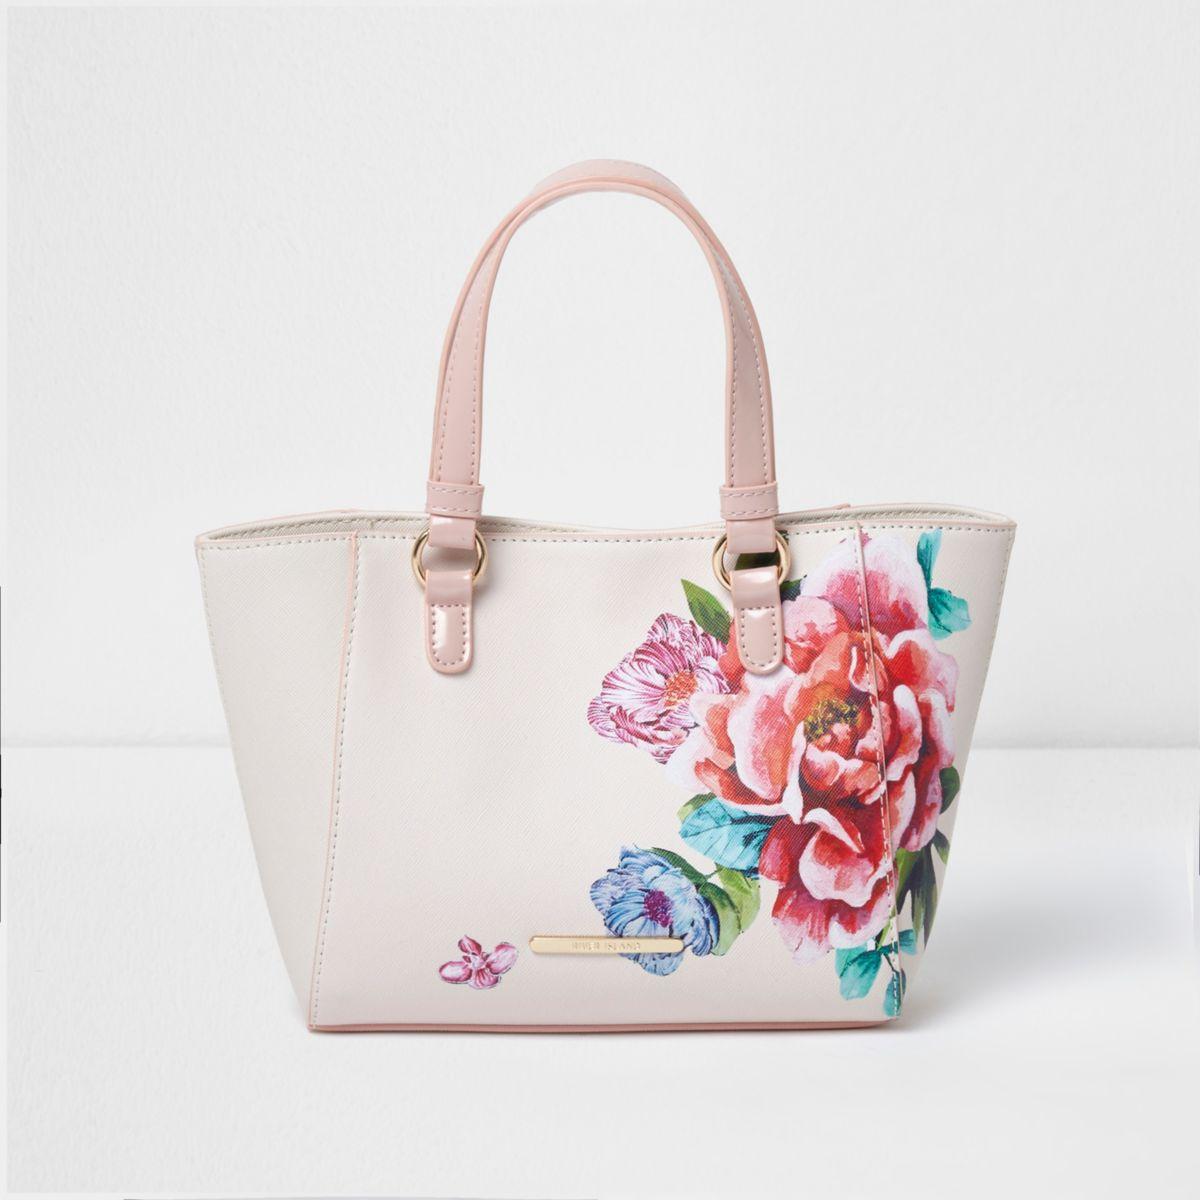 Girls pink floral print winged tote bag